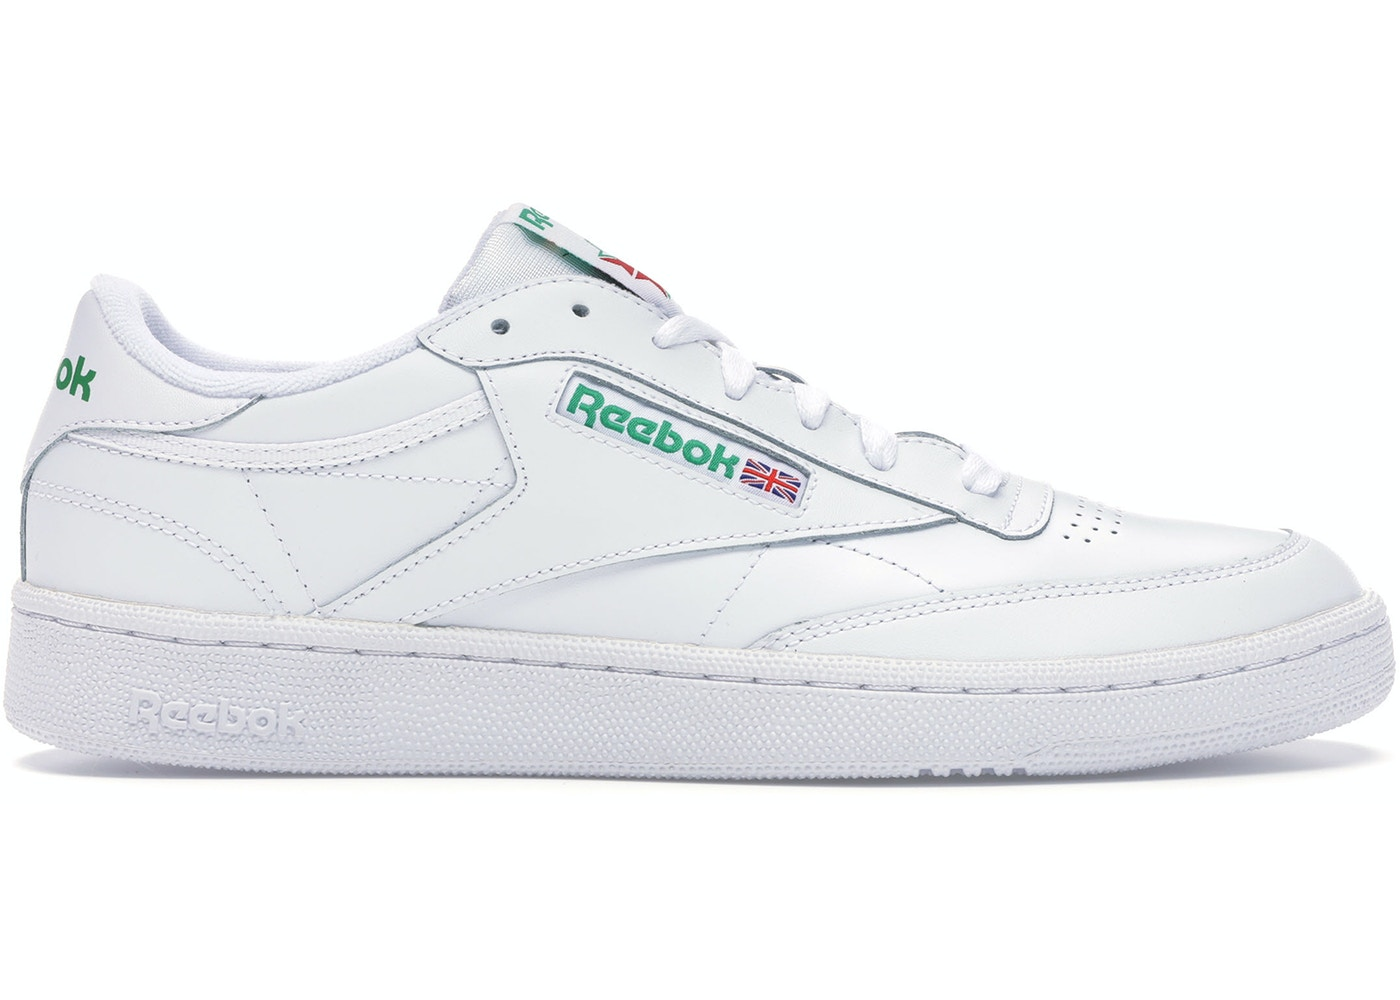 Reebok Club C 85 White/Green